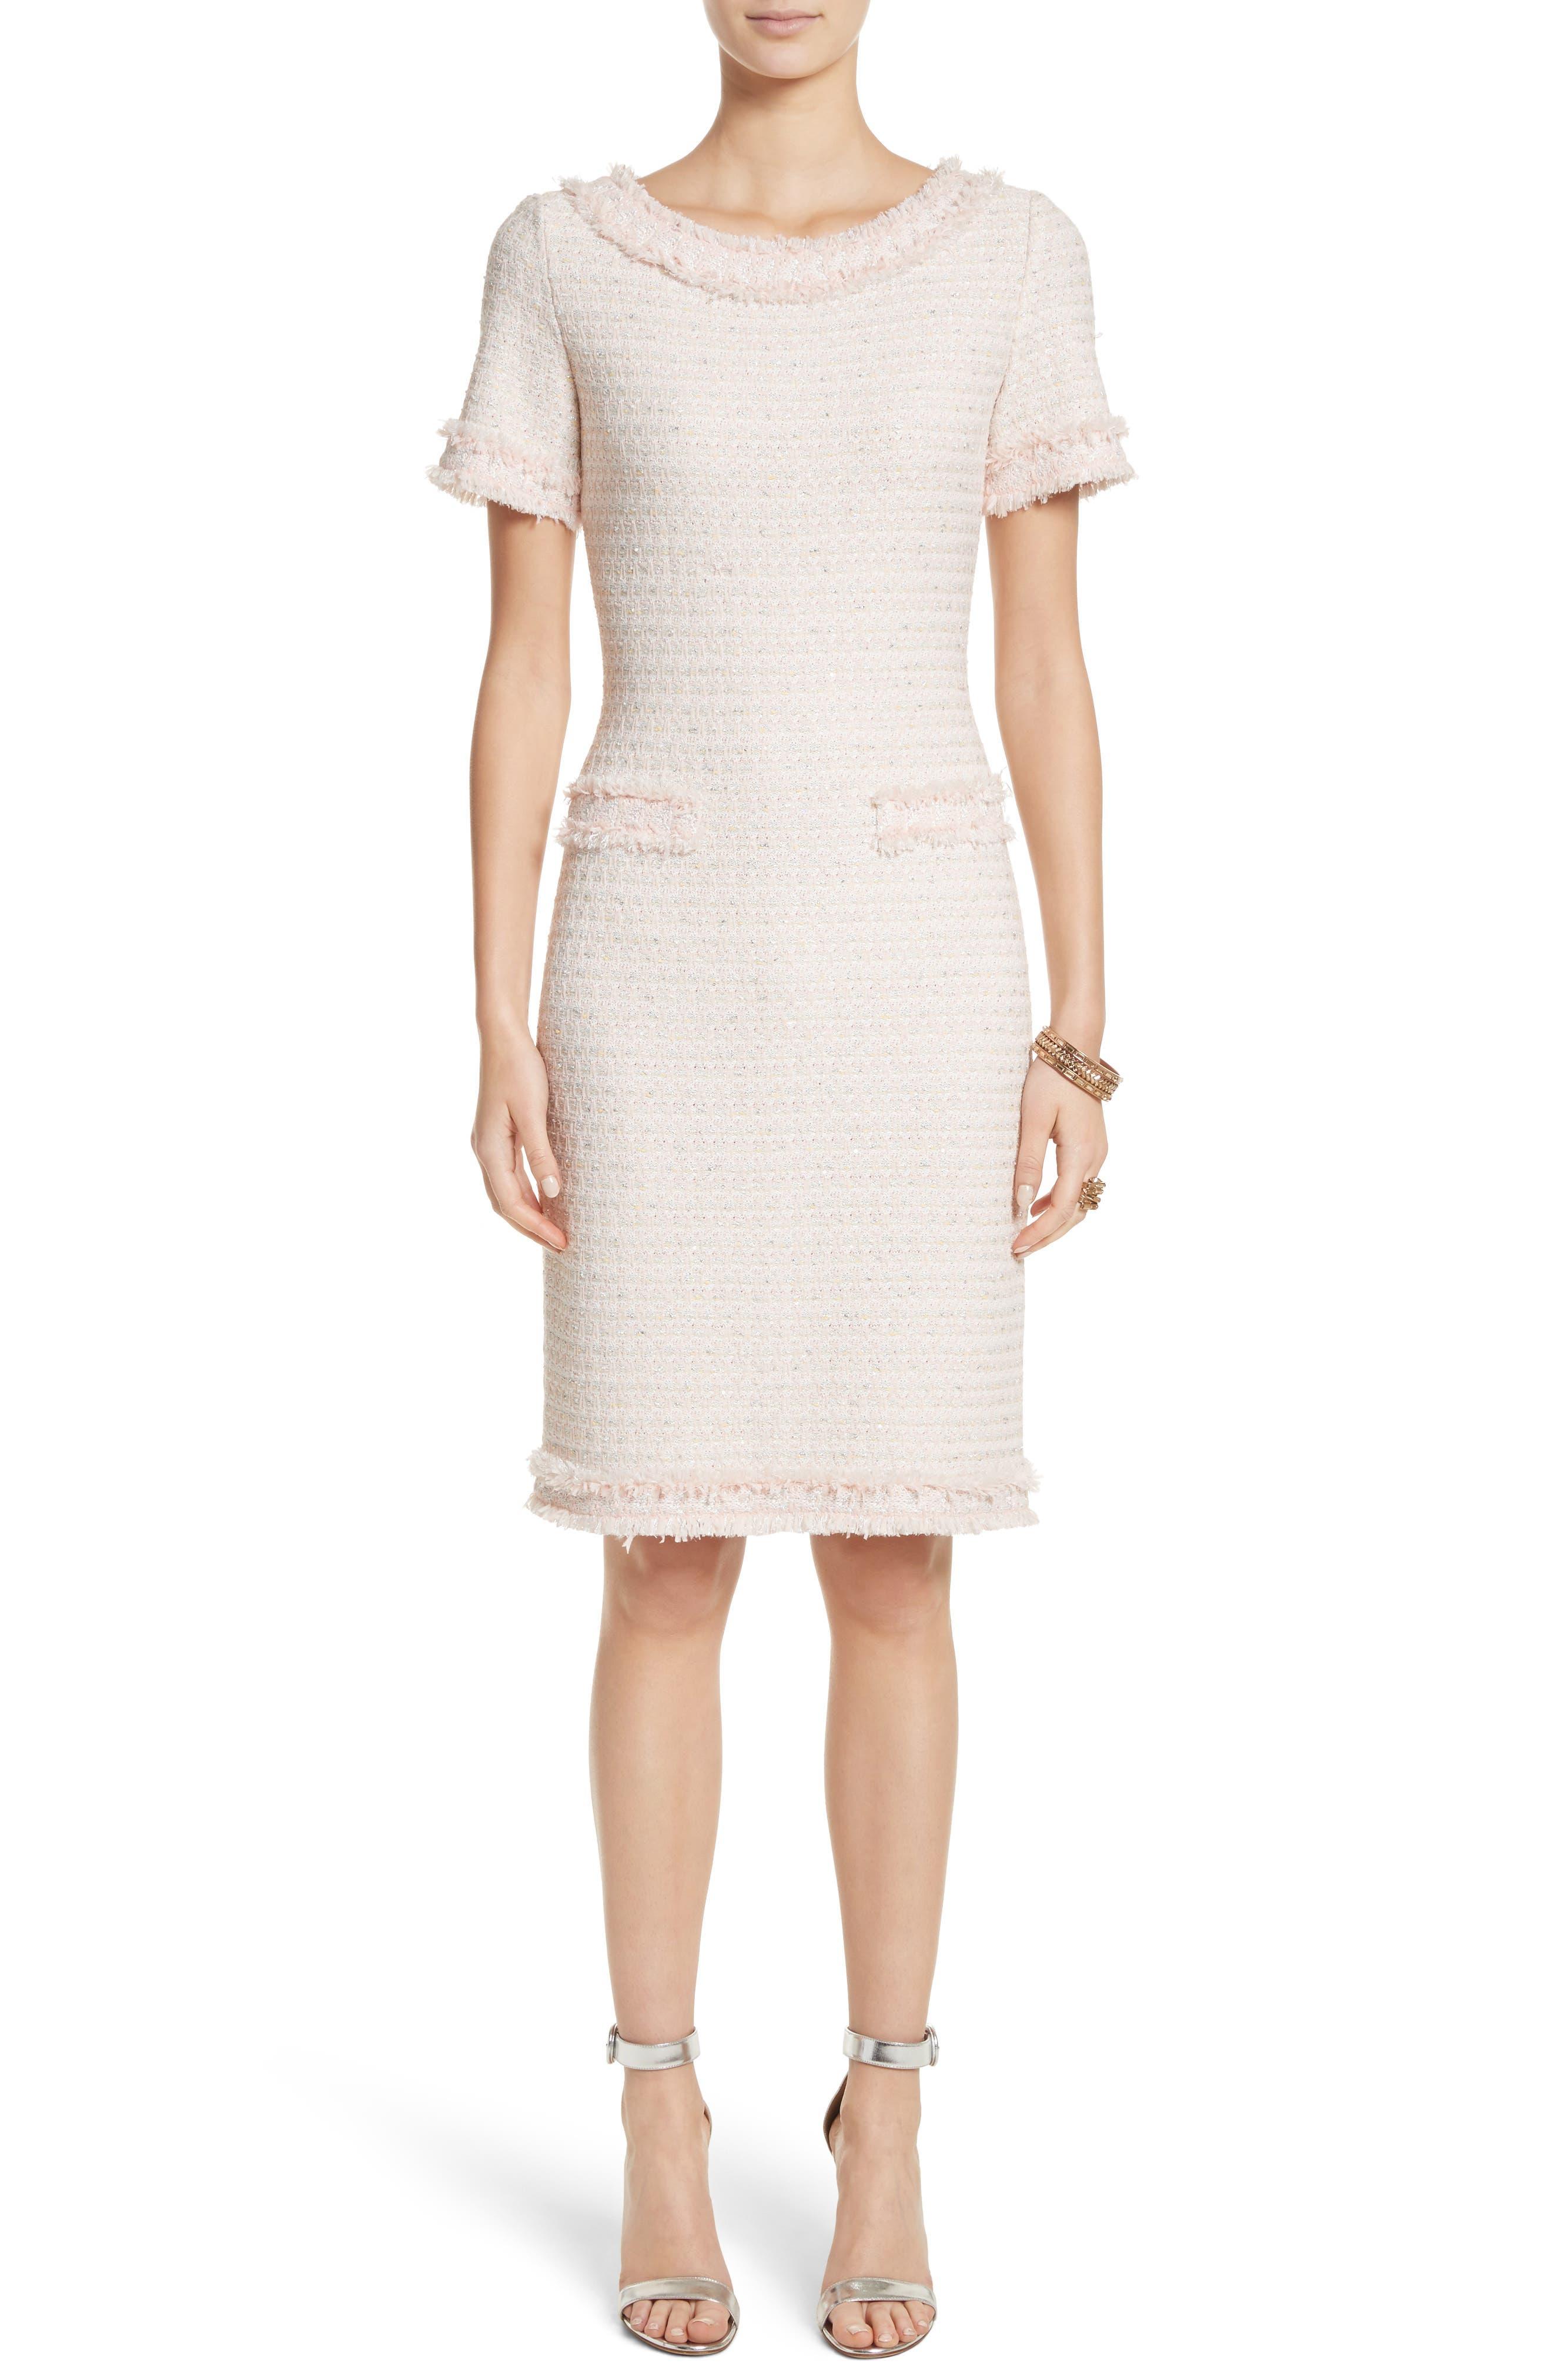 St. John Collection Lais Metallic Tweed Sheath Dress